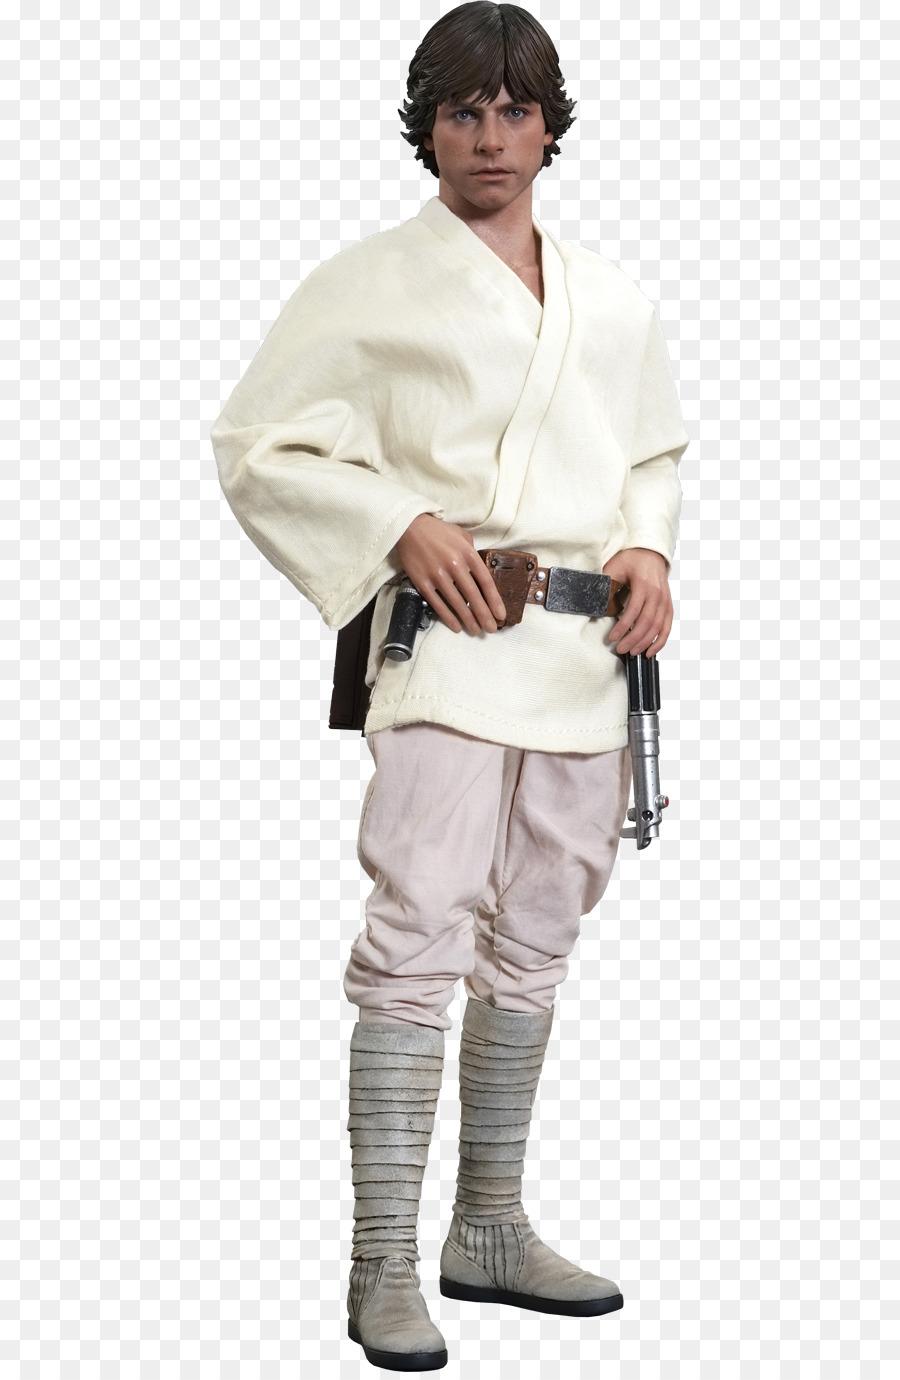 luke skywalker anakin skywalker obiwan kenobi chewbacca